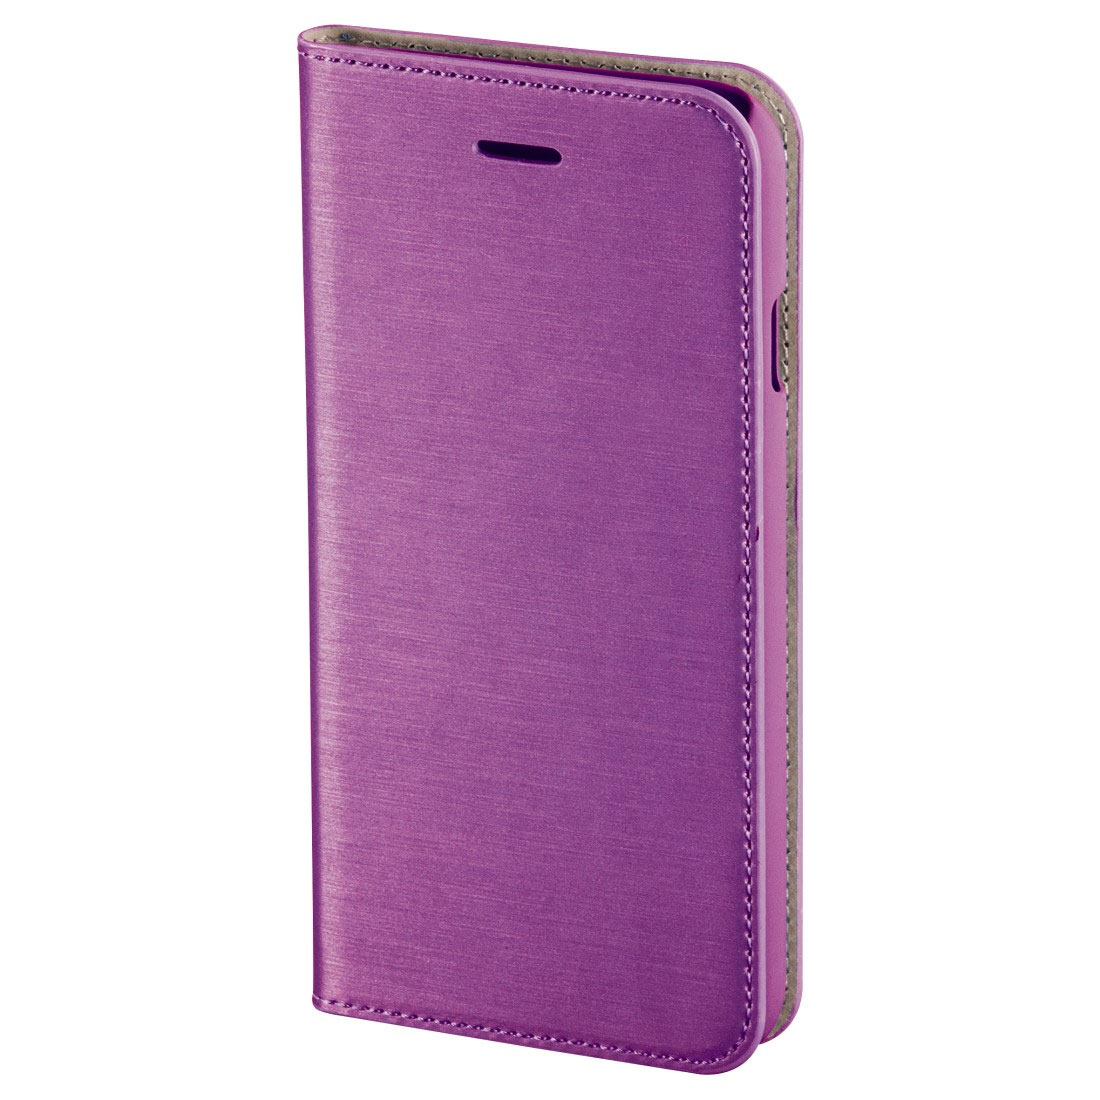 fiche technique hama 135065 slim booklet iphone 6s crocus pink avcesar. Black Bedroom Furniture Sets. Home Design Ideas